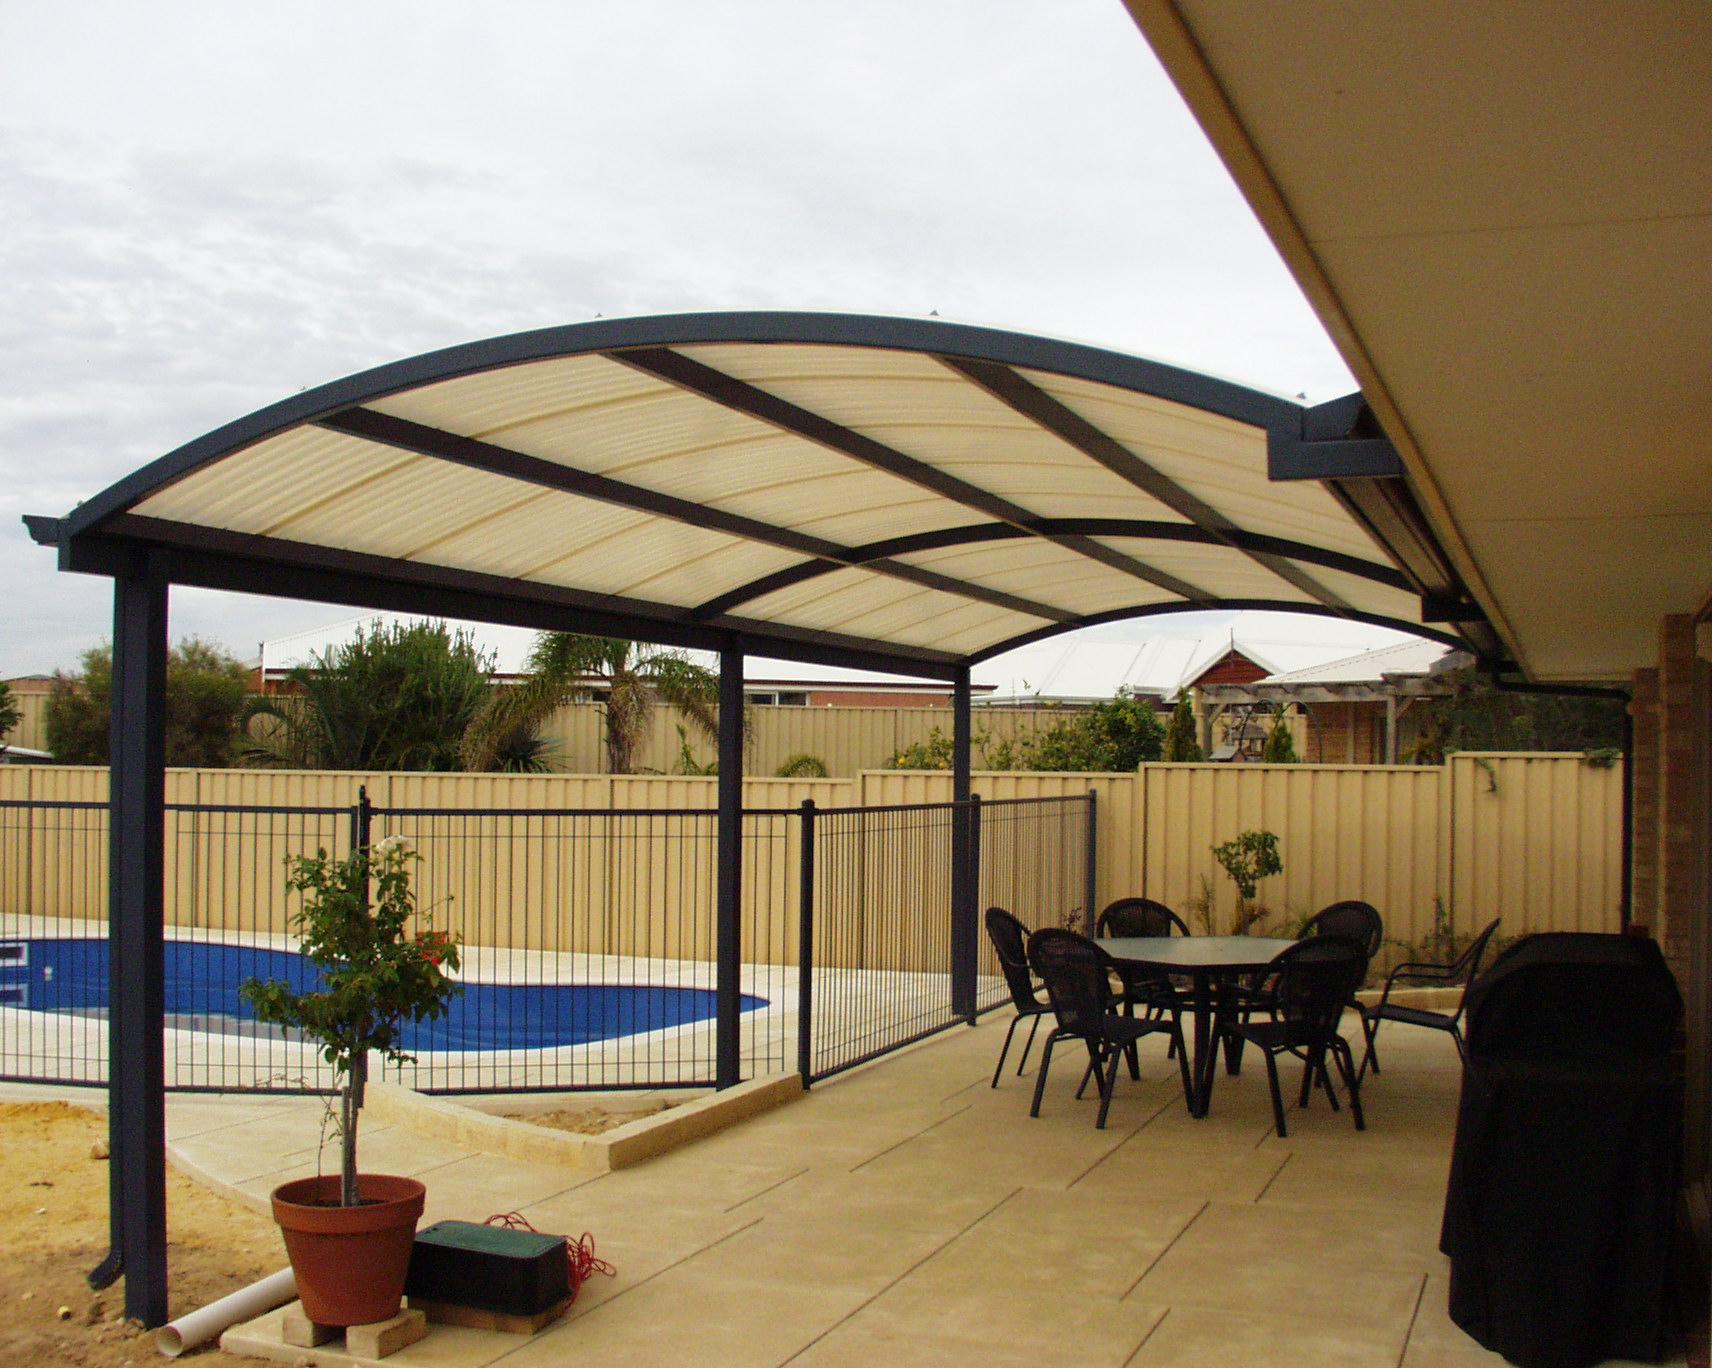 Backyard Patio Covers From Usefulness To Style Homesfeed